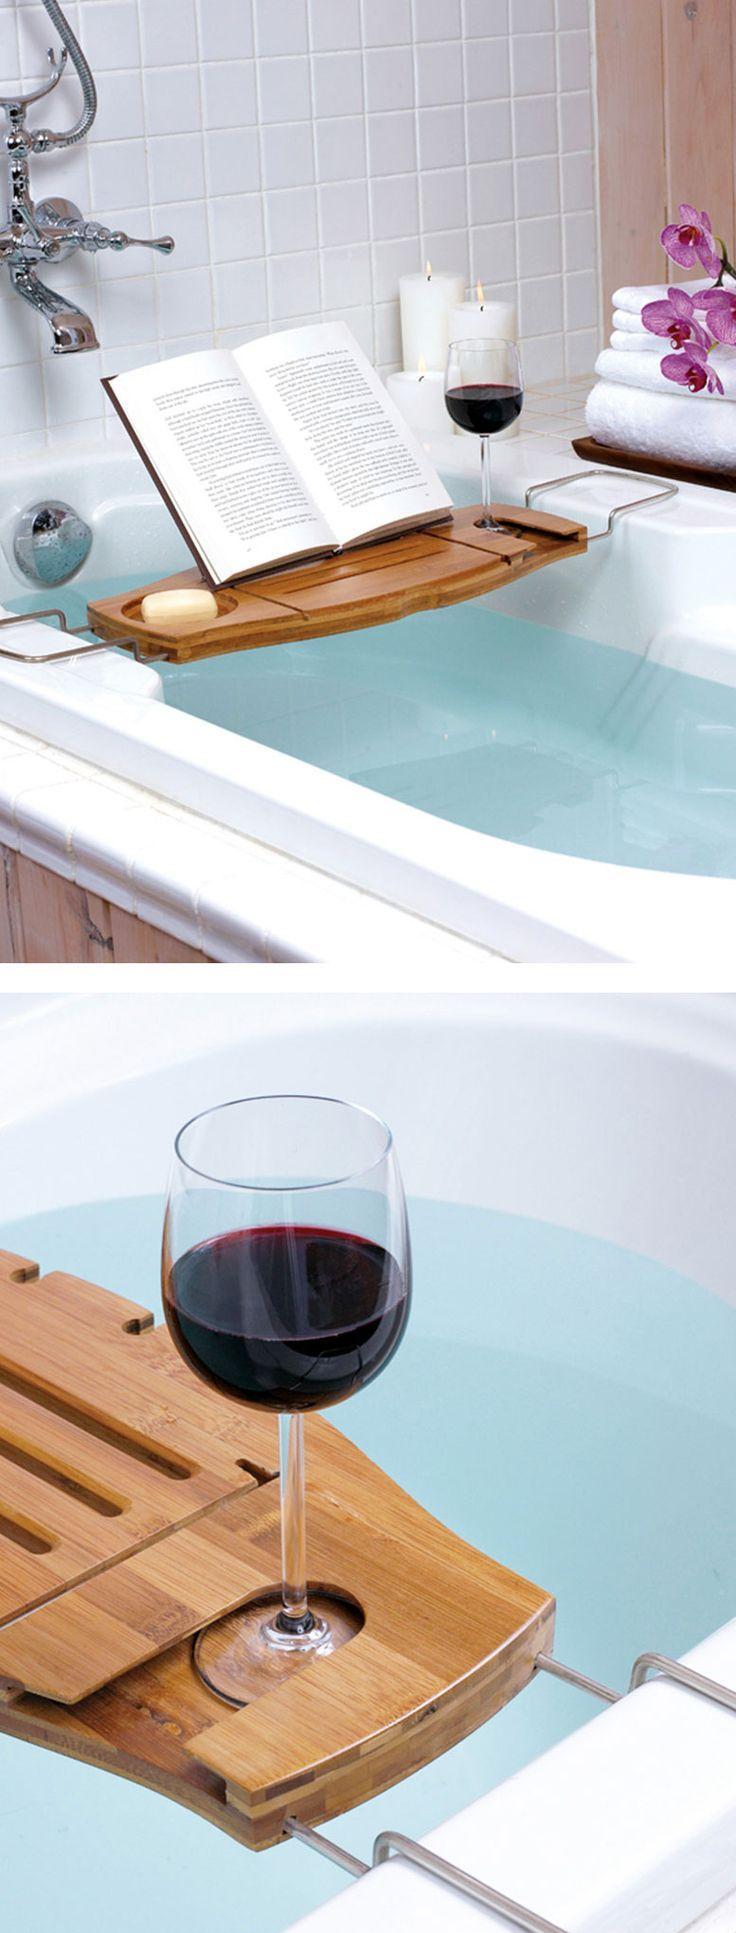 Ultimate Bath Caddy ❤ L.O.V.E. #relax #bathroom #spaday